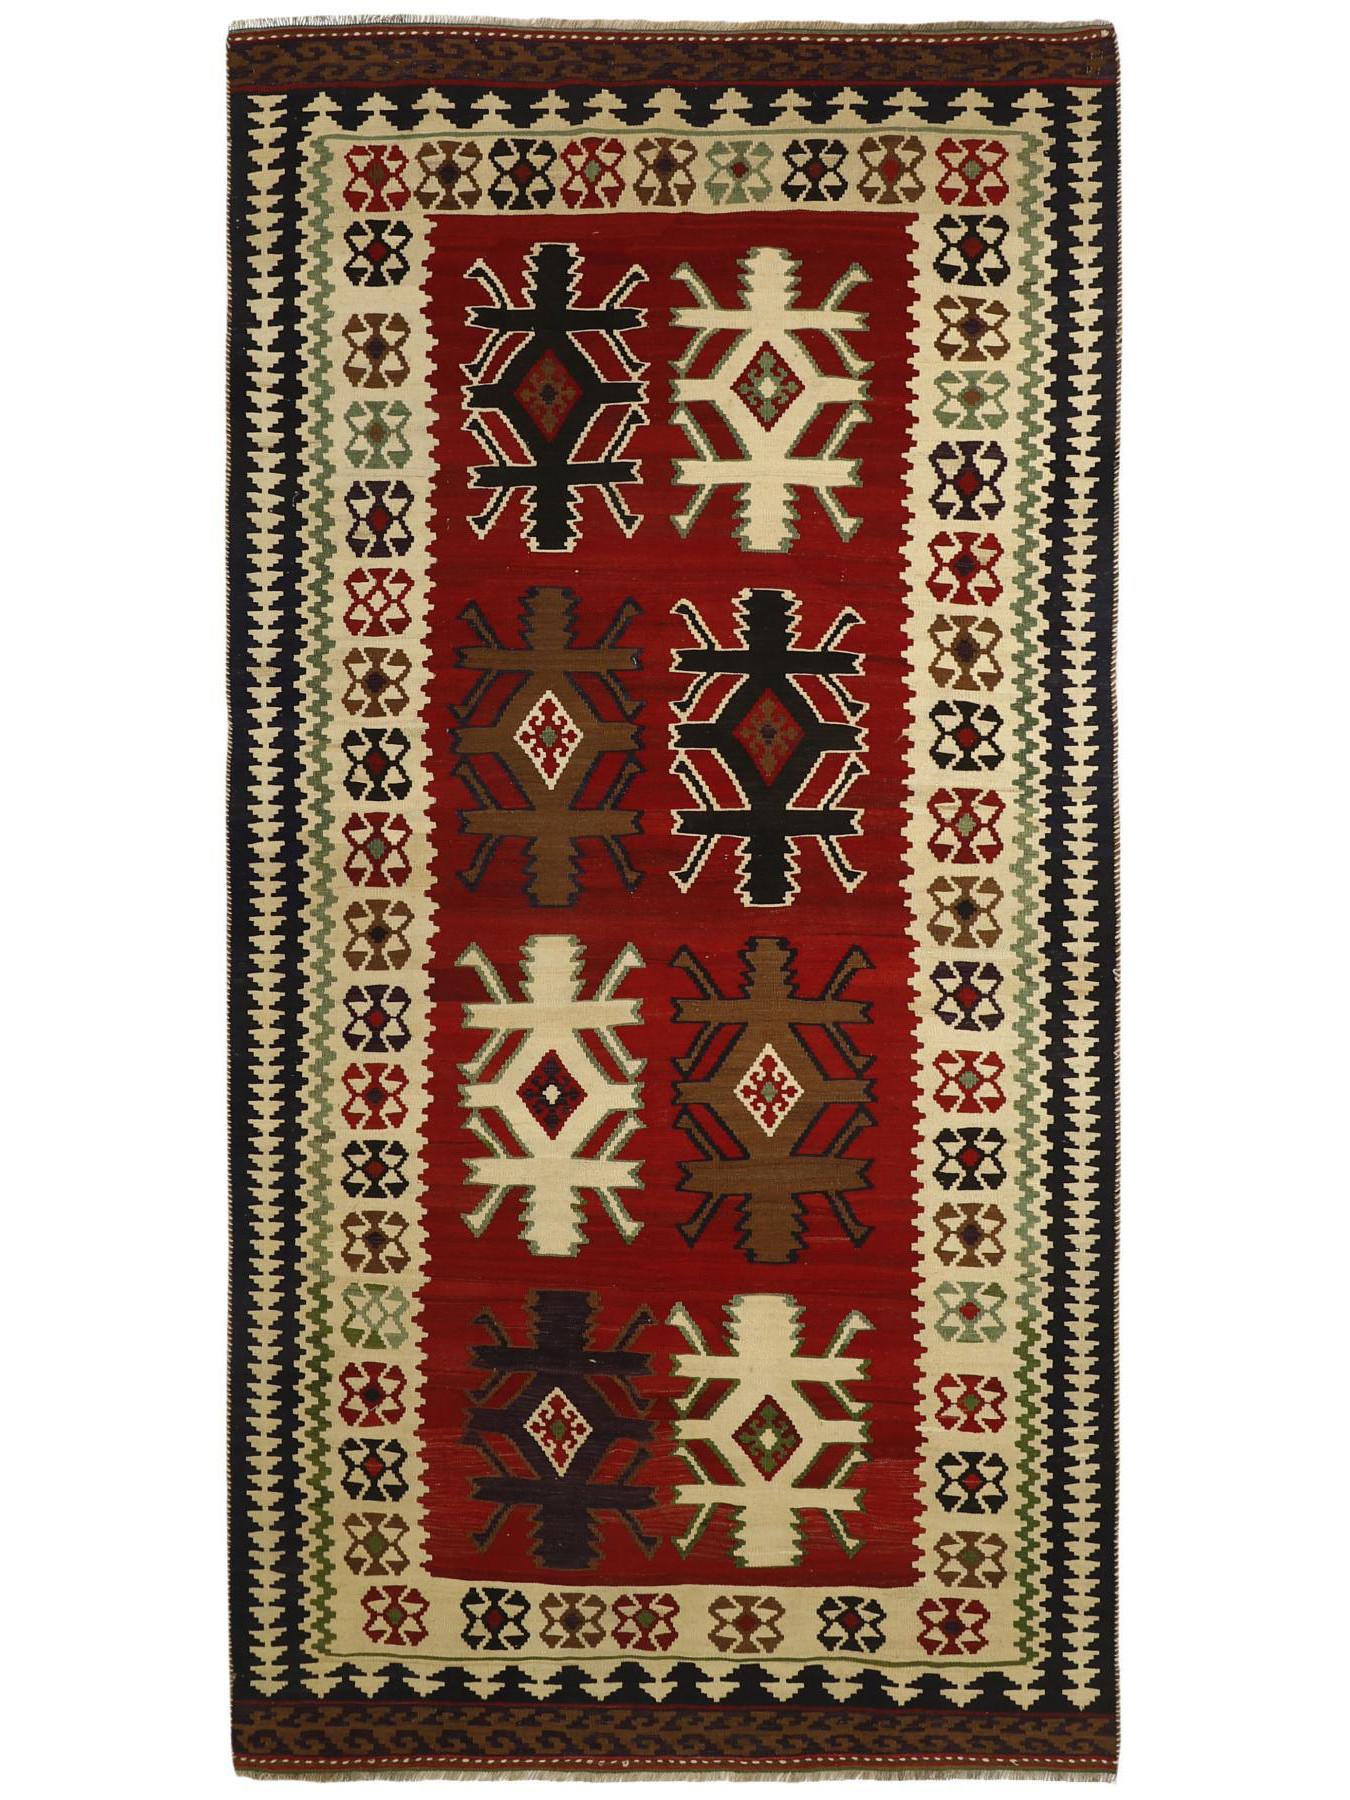 Traditional kilims - Kilim Persian Vintage